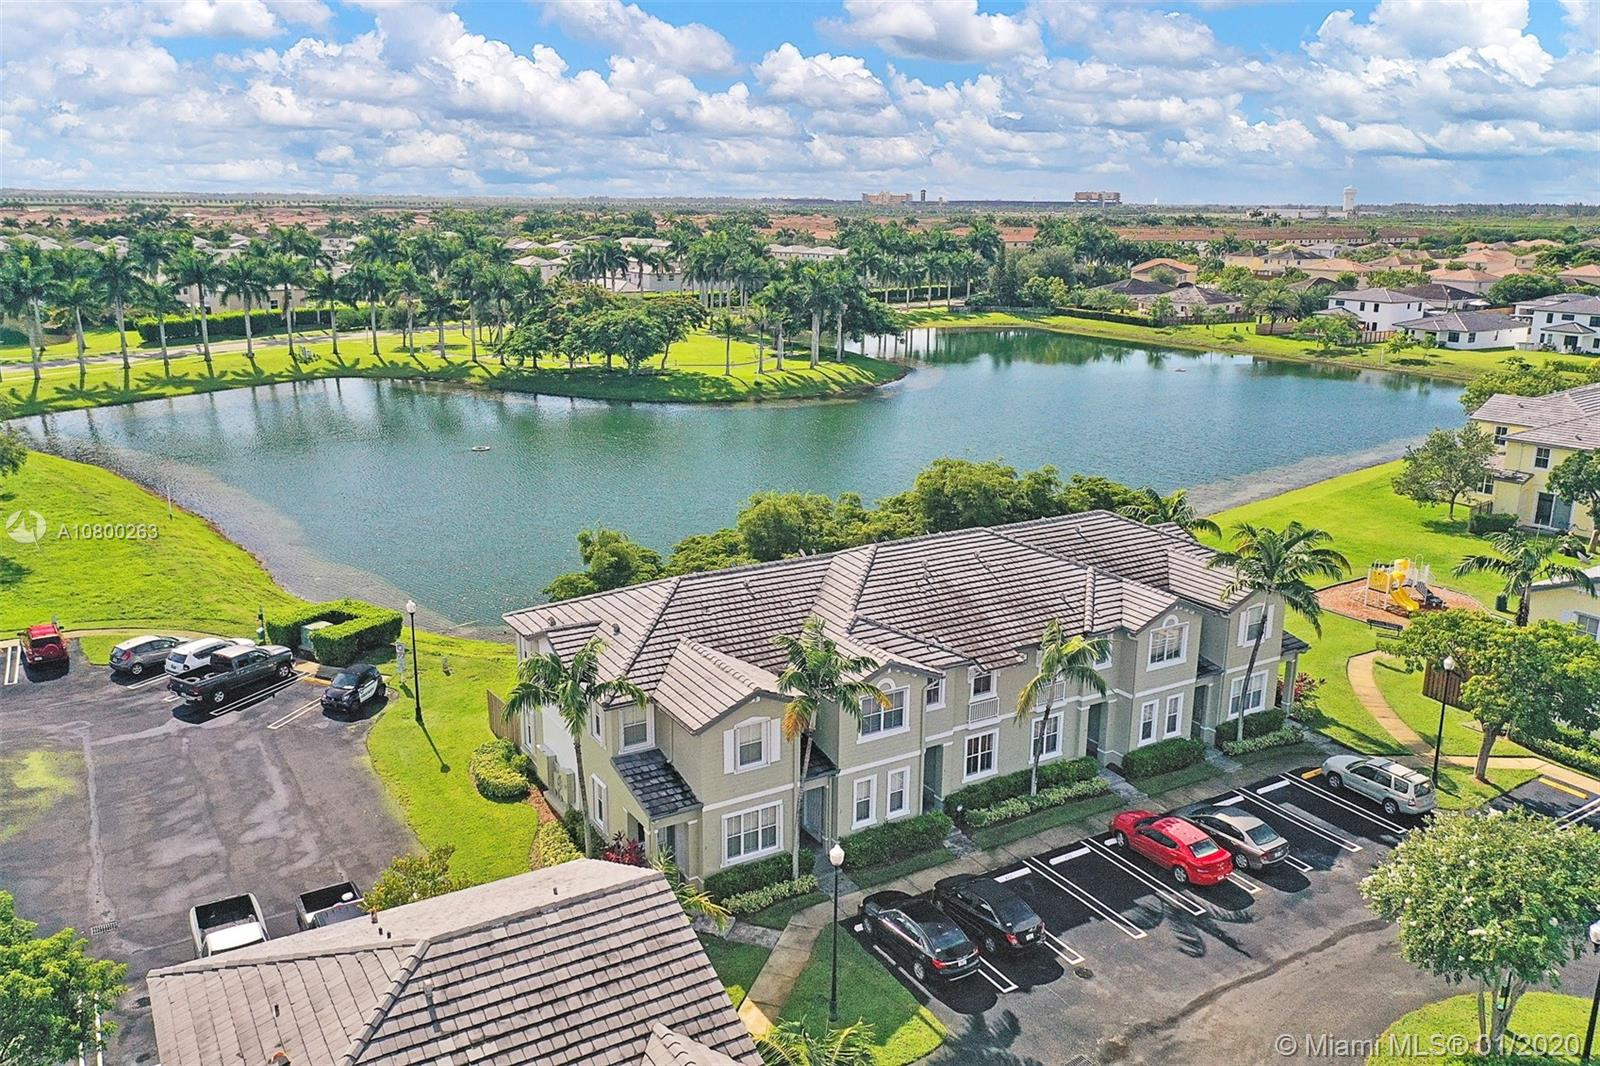 205 SE 29th Ter #1, Homestead, FL 33033 - Homestead, FL real estate listing